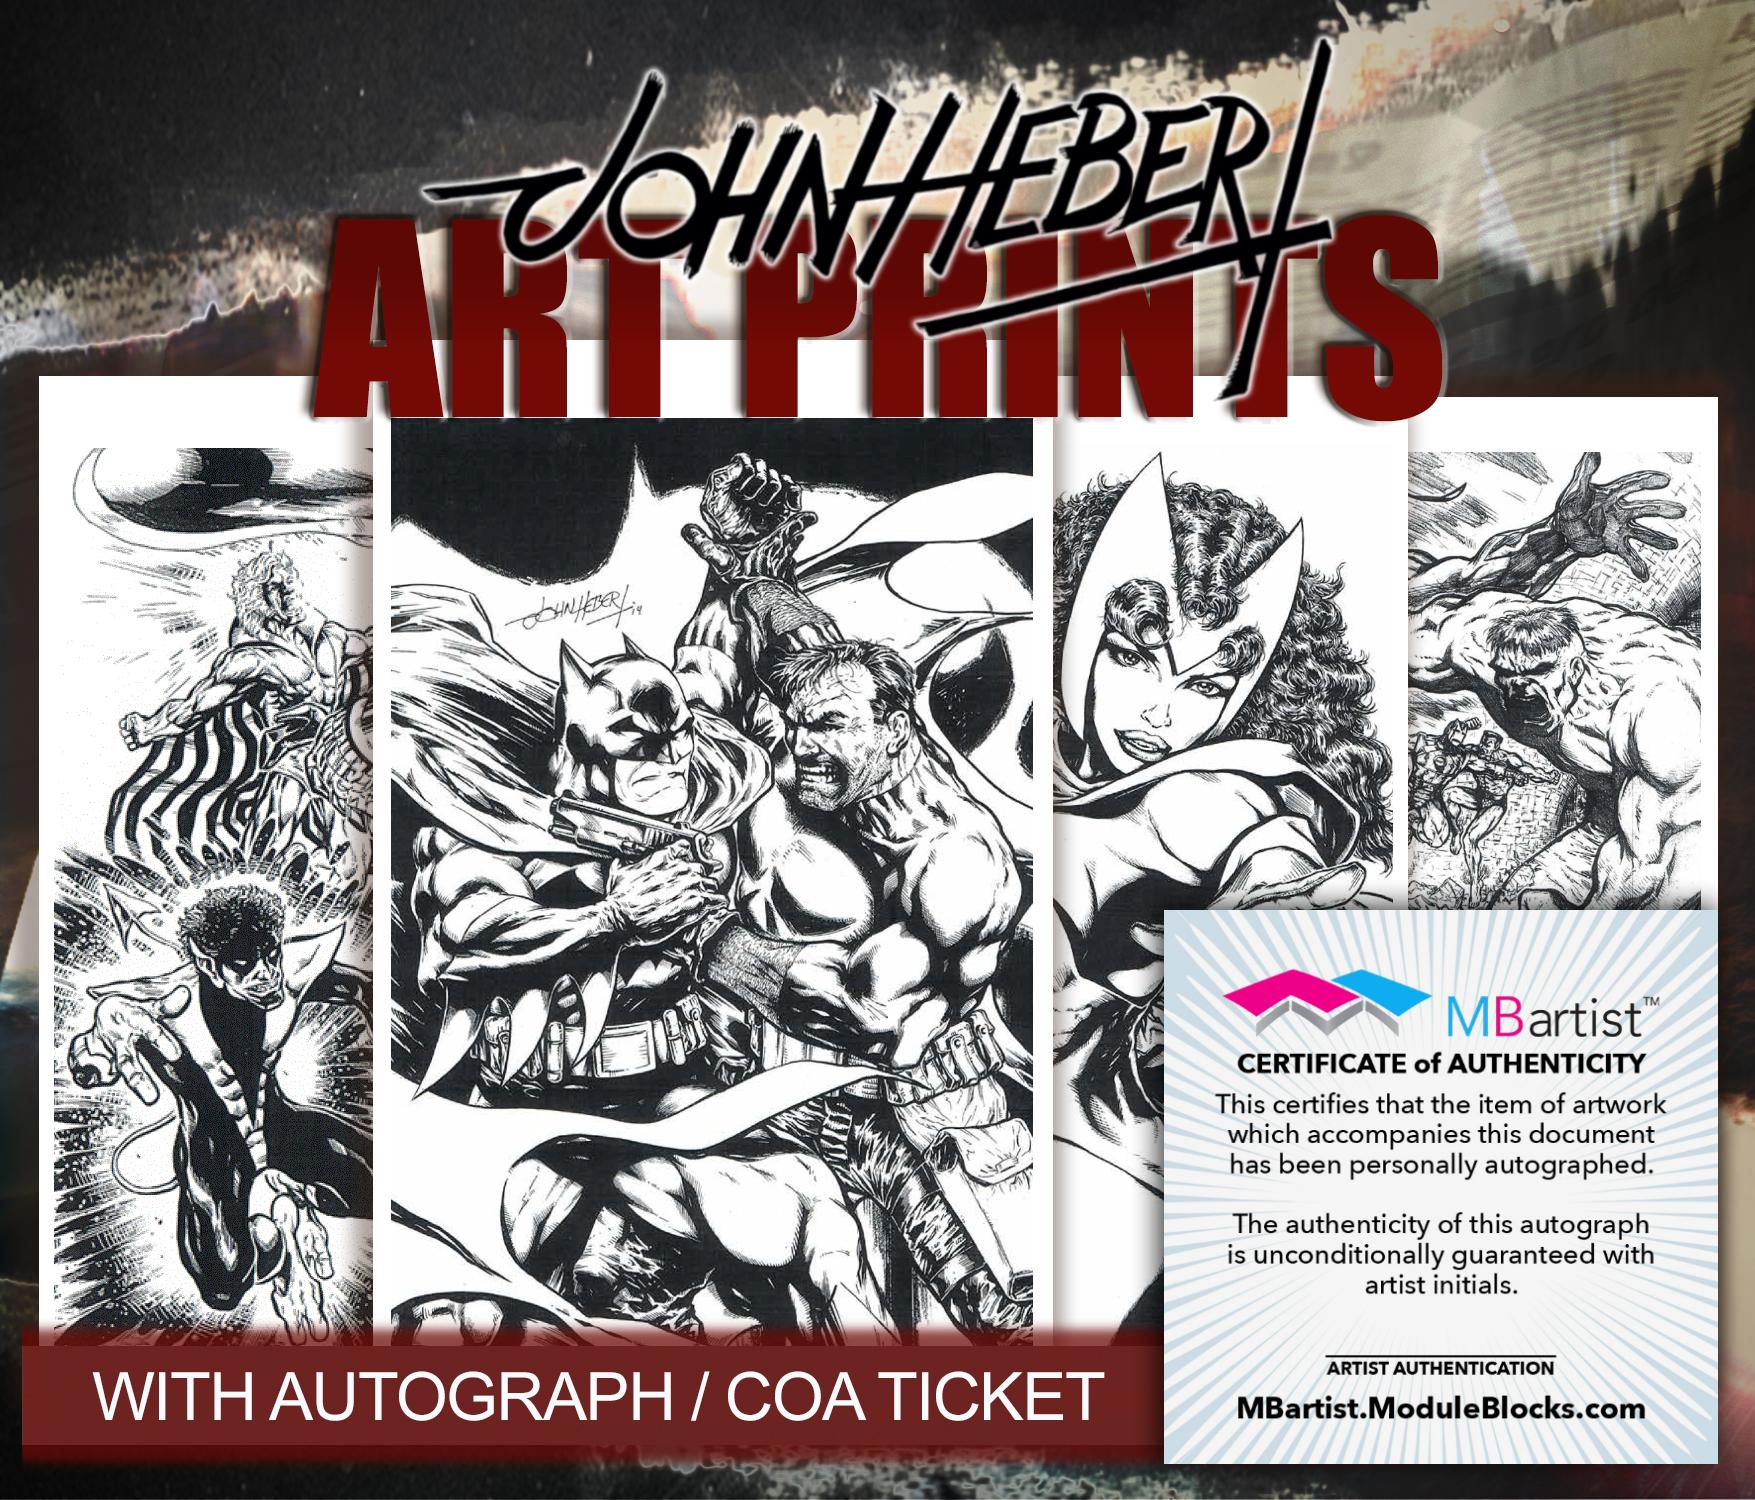 John Hebert: Art Prints